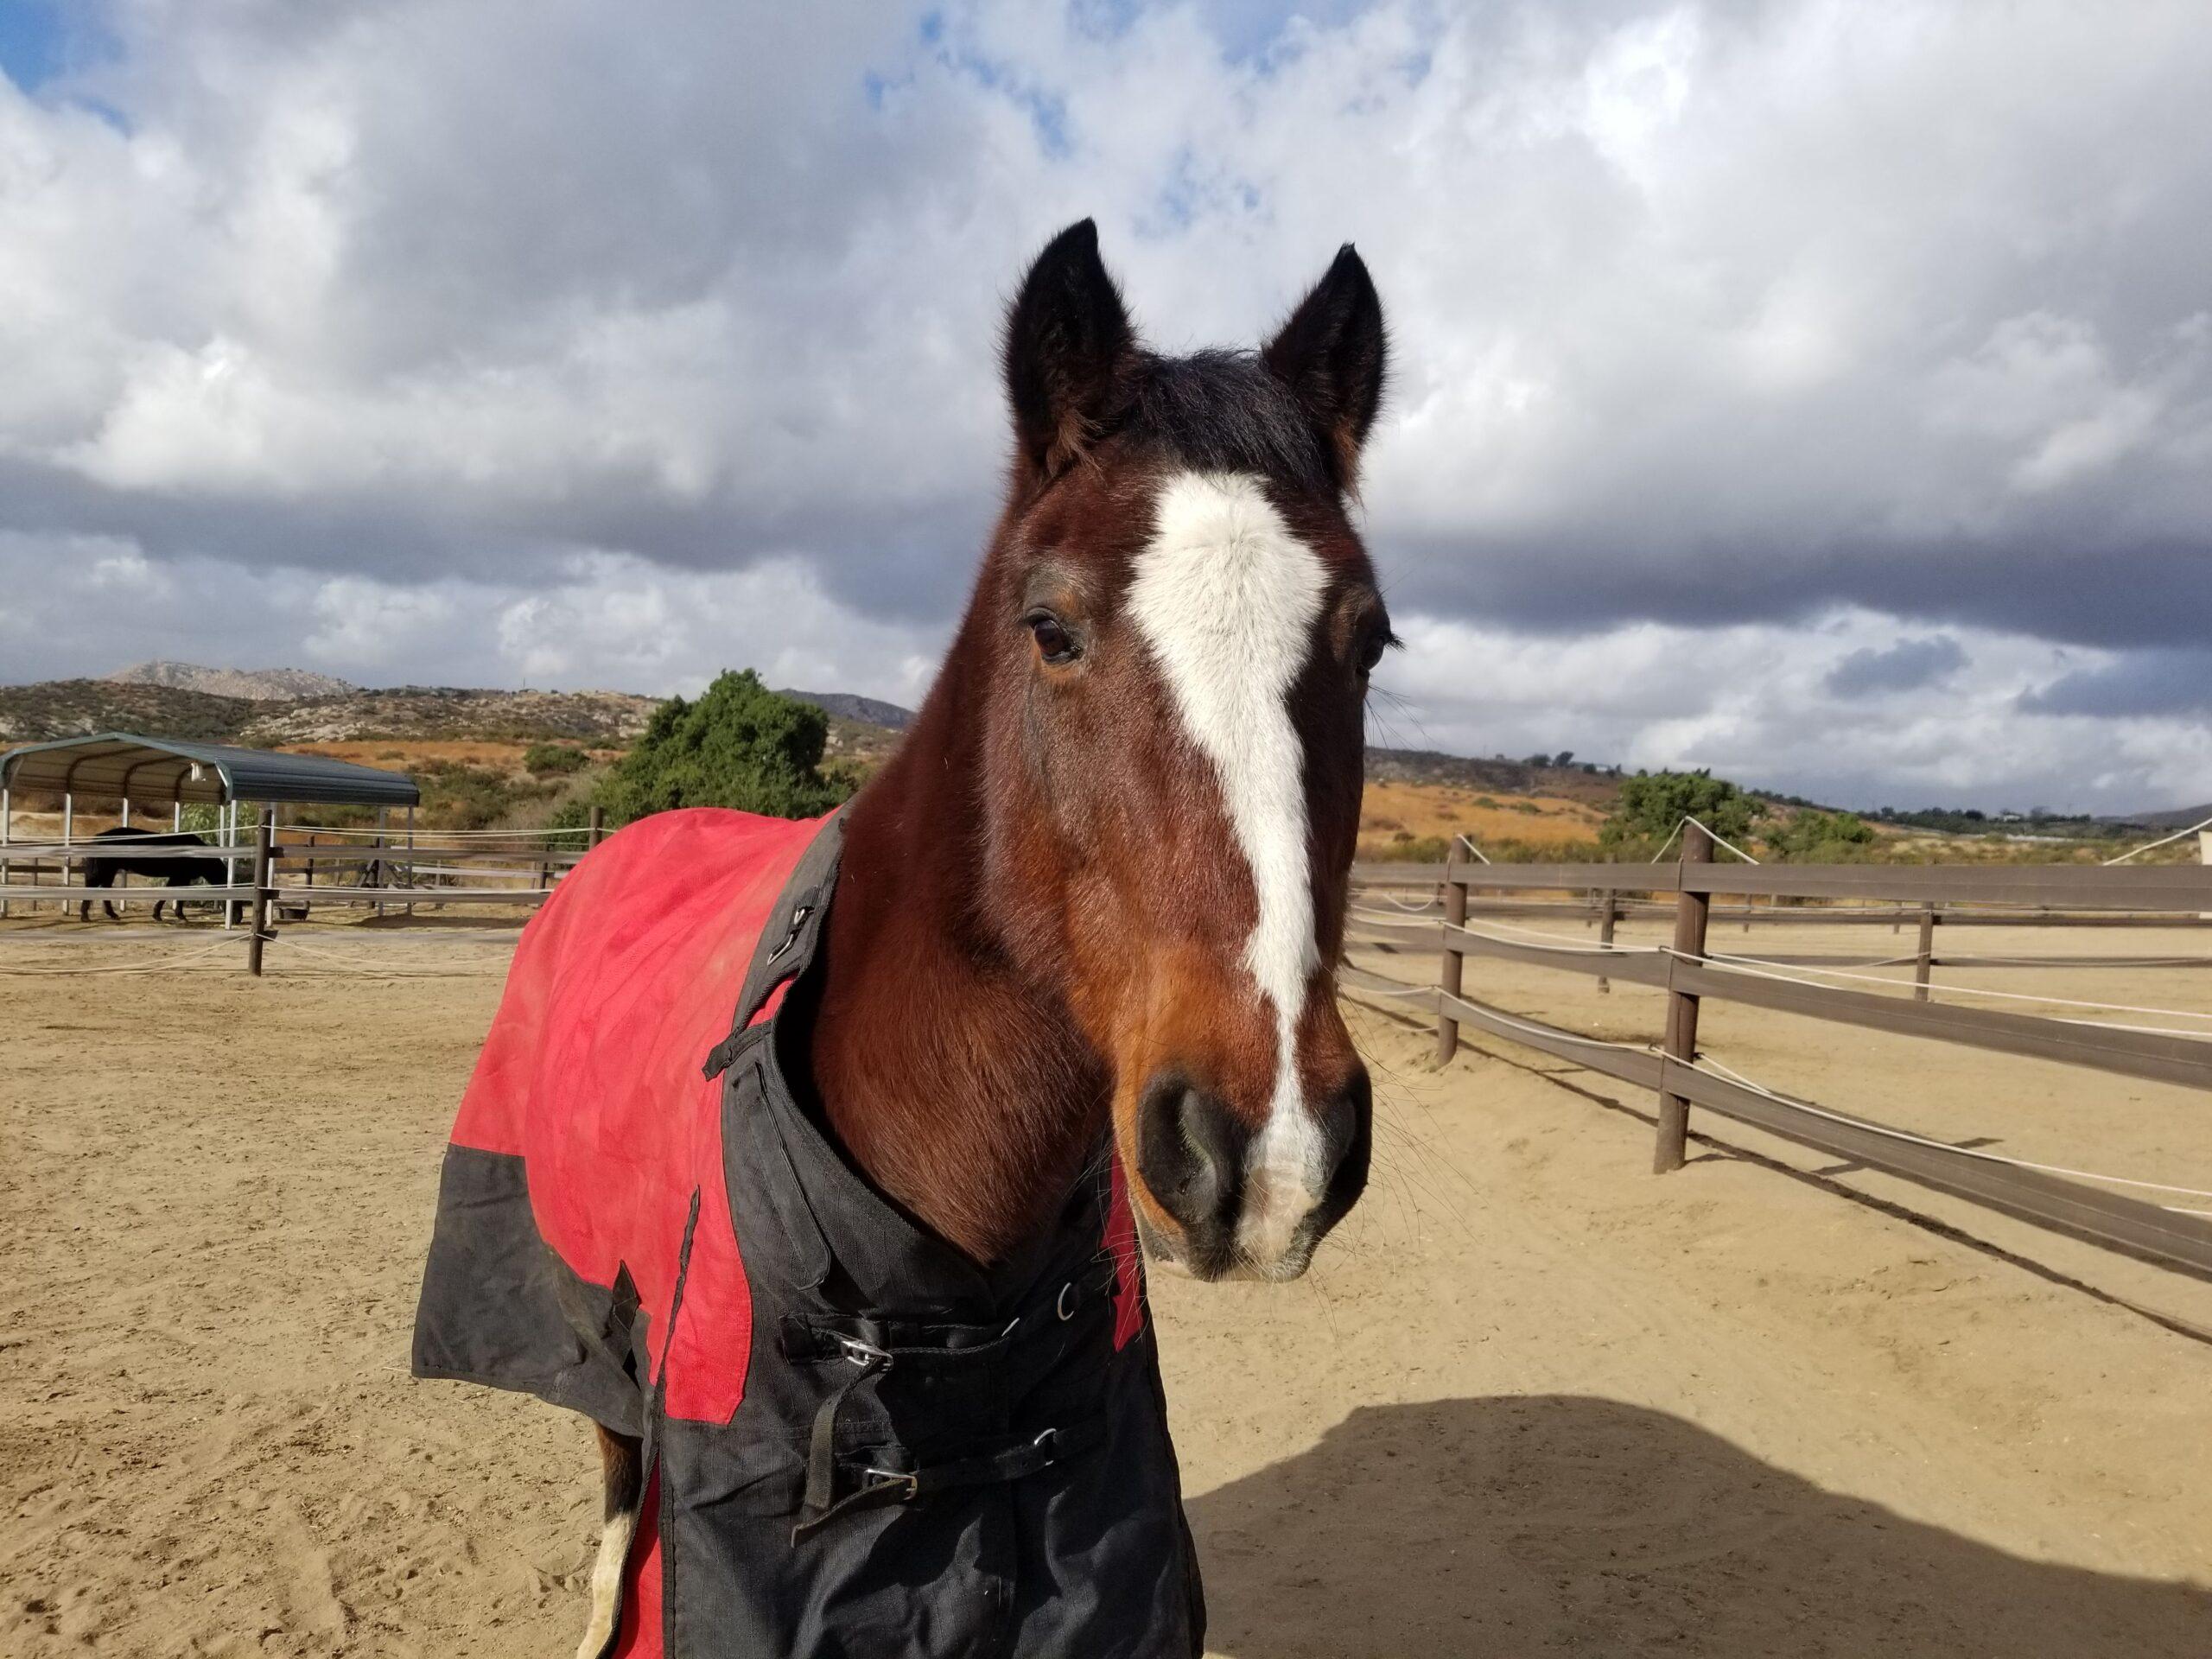 Waylon the horse